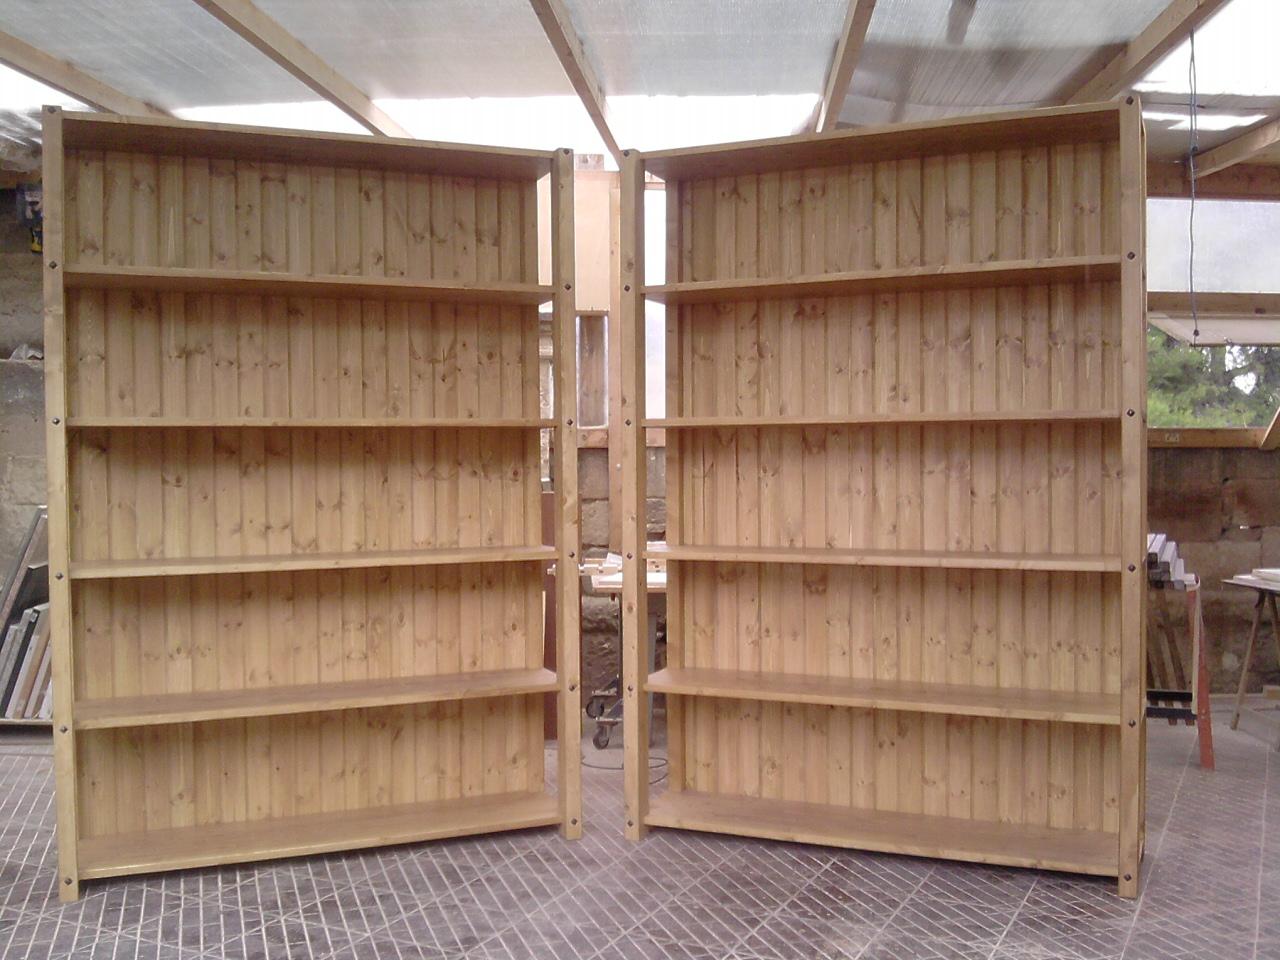 Fai da te hobby legno scaffale for Scaffali per furgoni fai da te